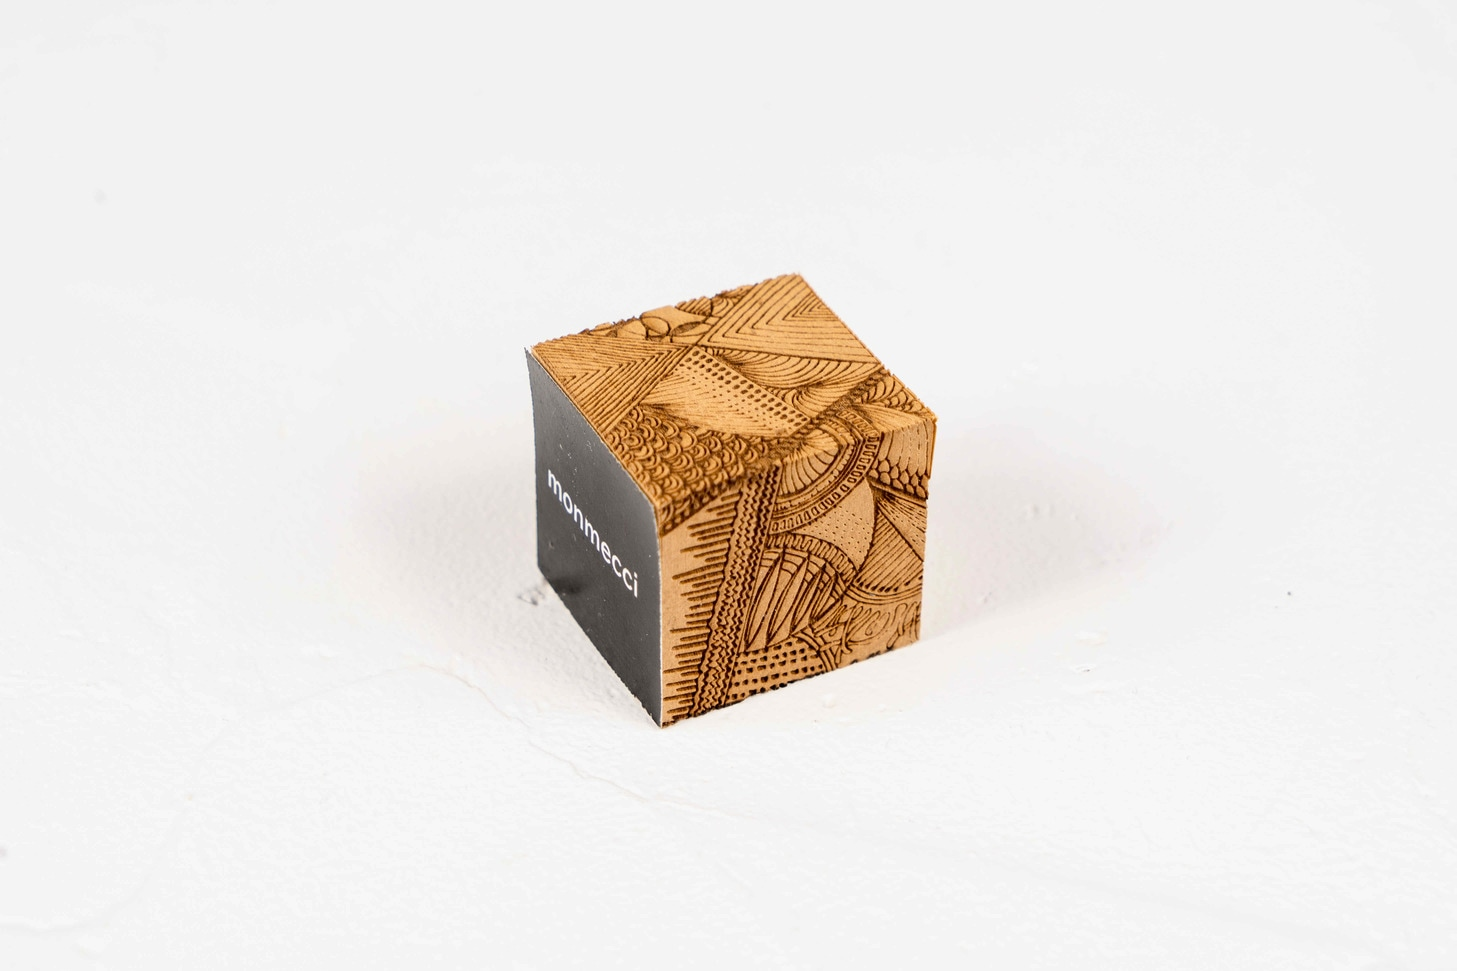 monmecci(モンメッチ)の彫刻フセン,正方形で幾何学模様が彫り込まれた小さな付箋,札幌スタイル認証製品